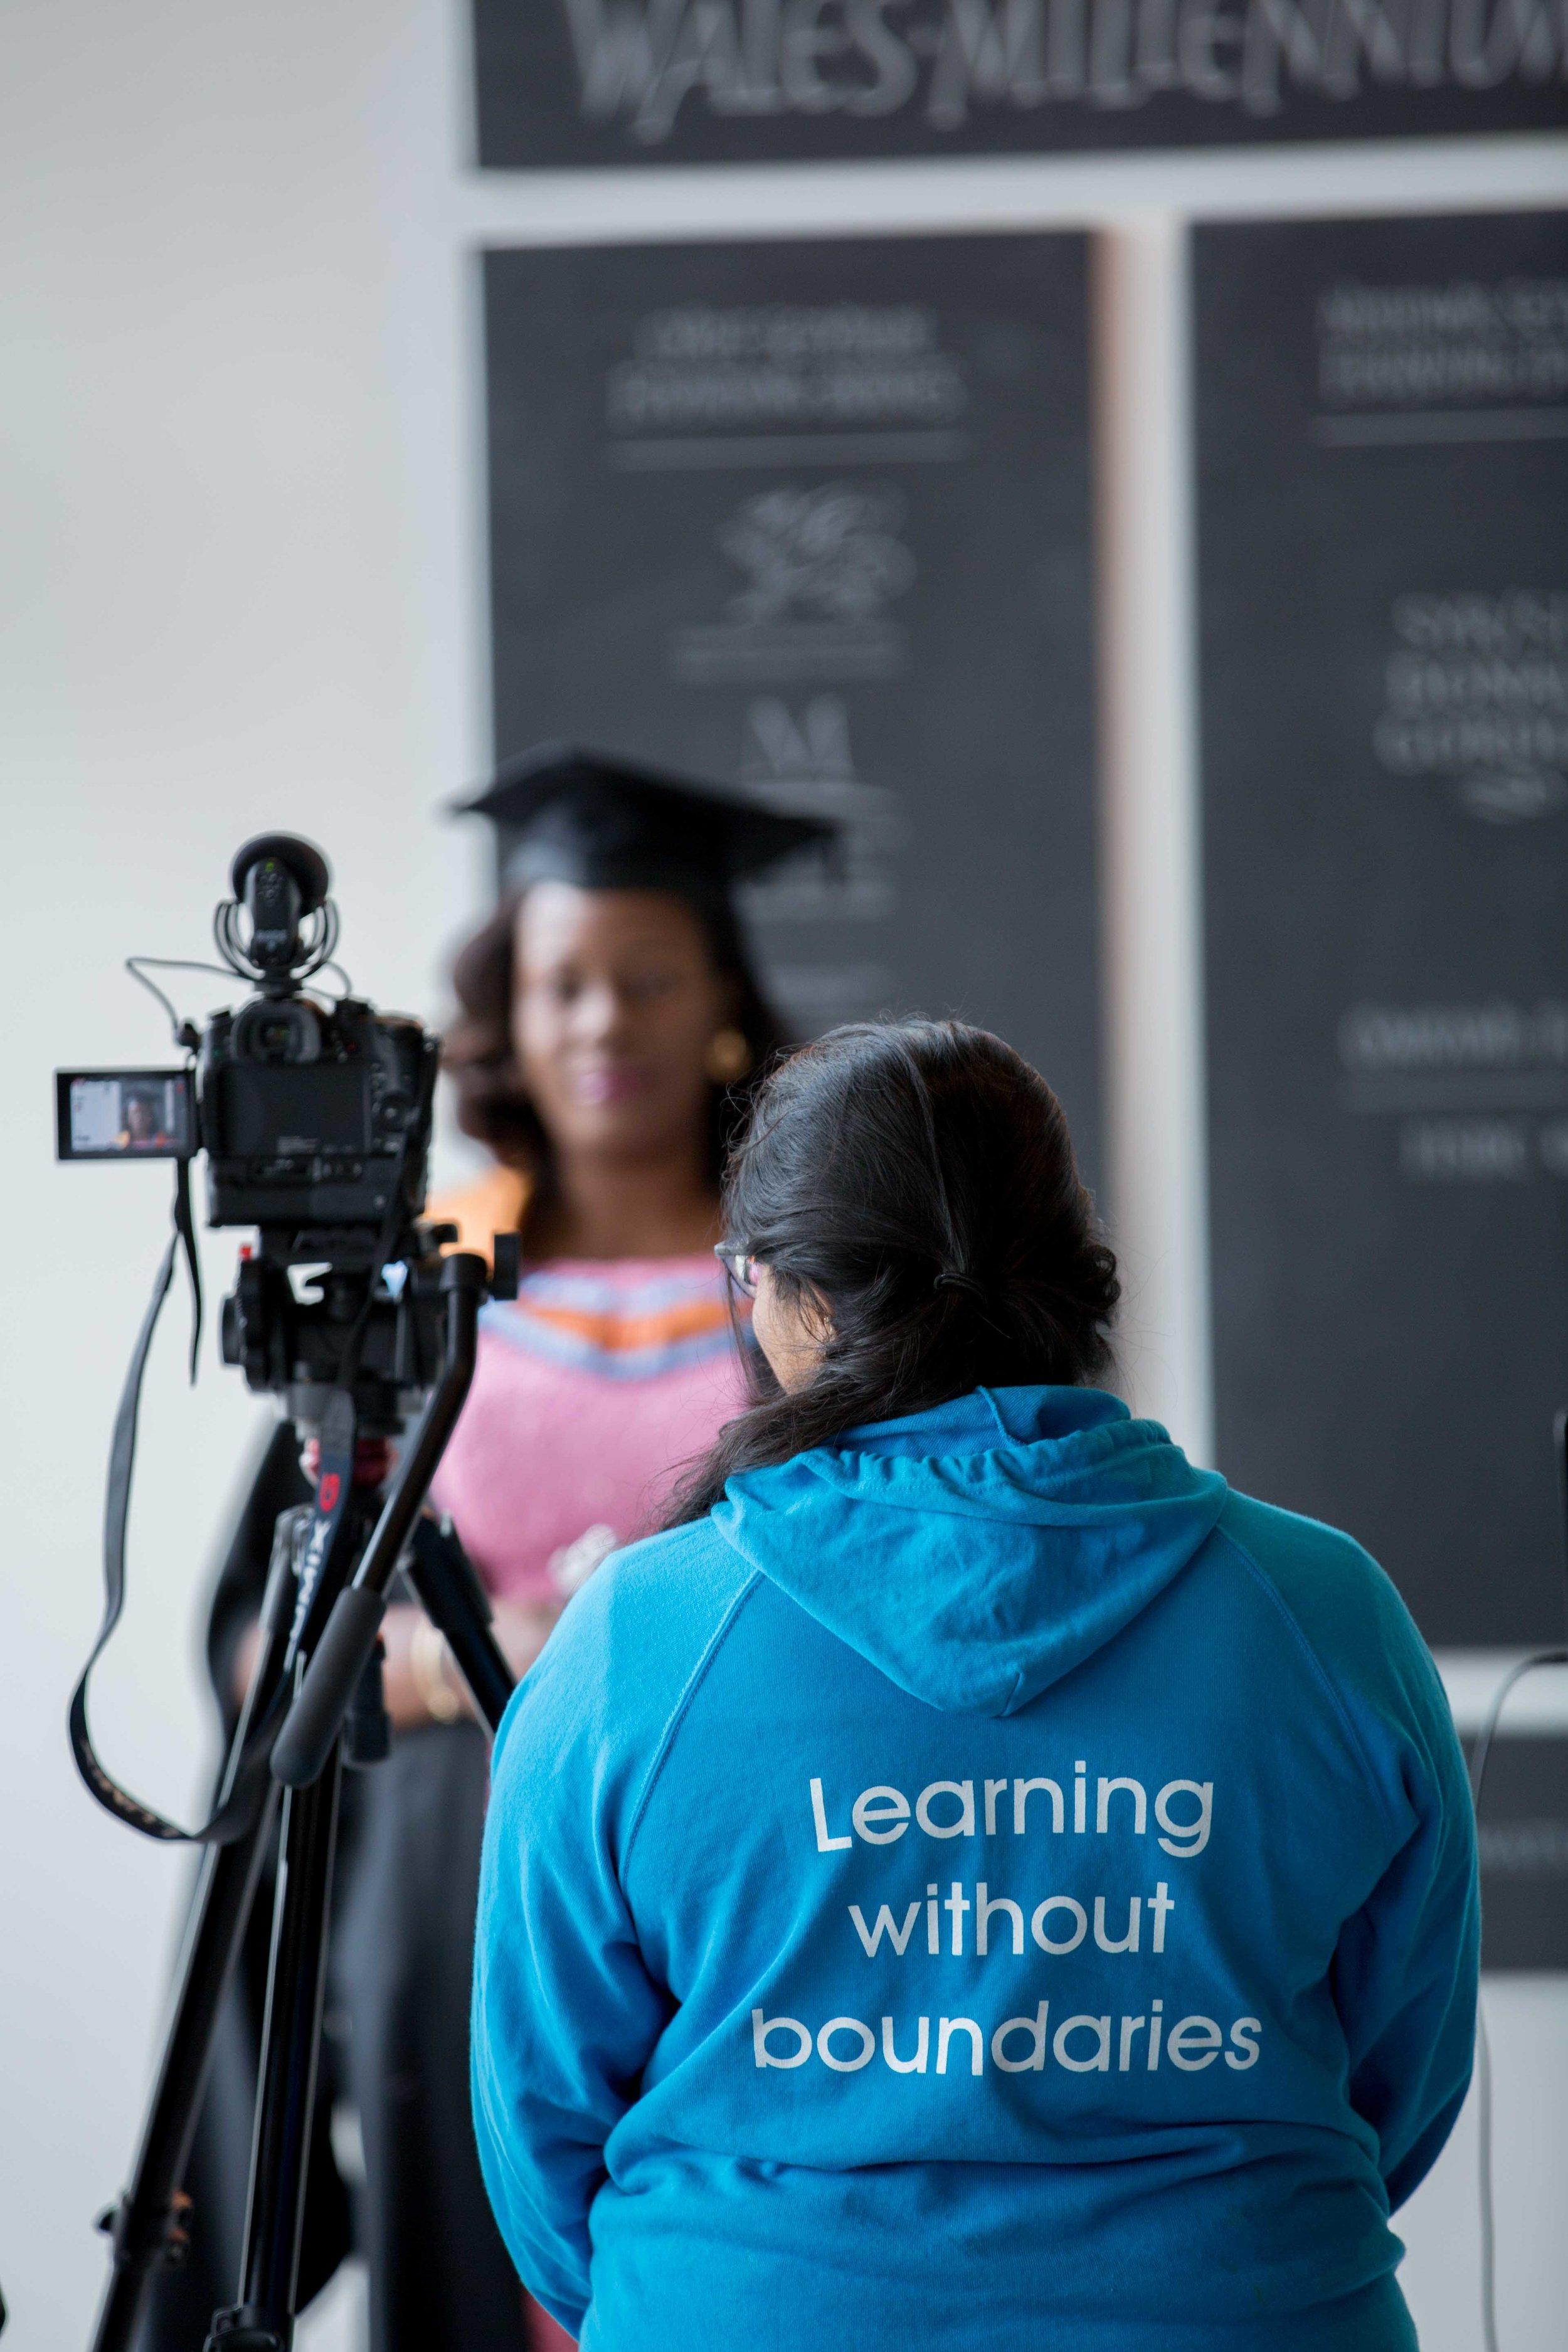 Arden-university-graduation-commercial-photographer-cardiff-natalia-smith-photography-30.jpg